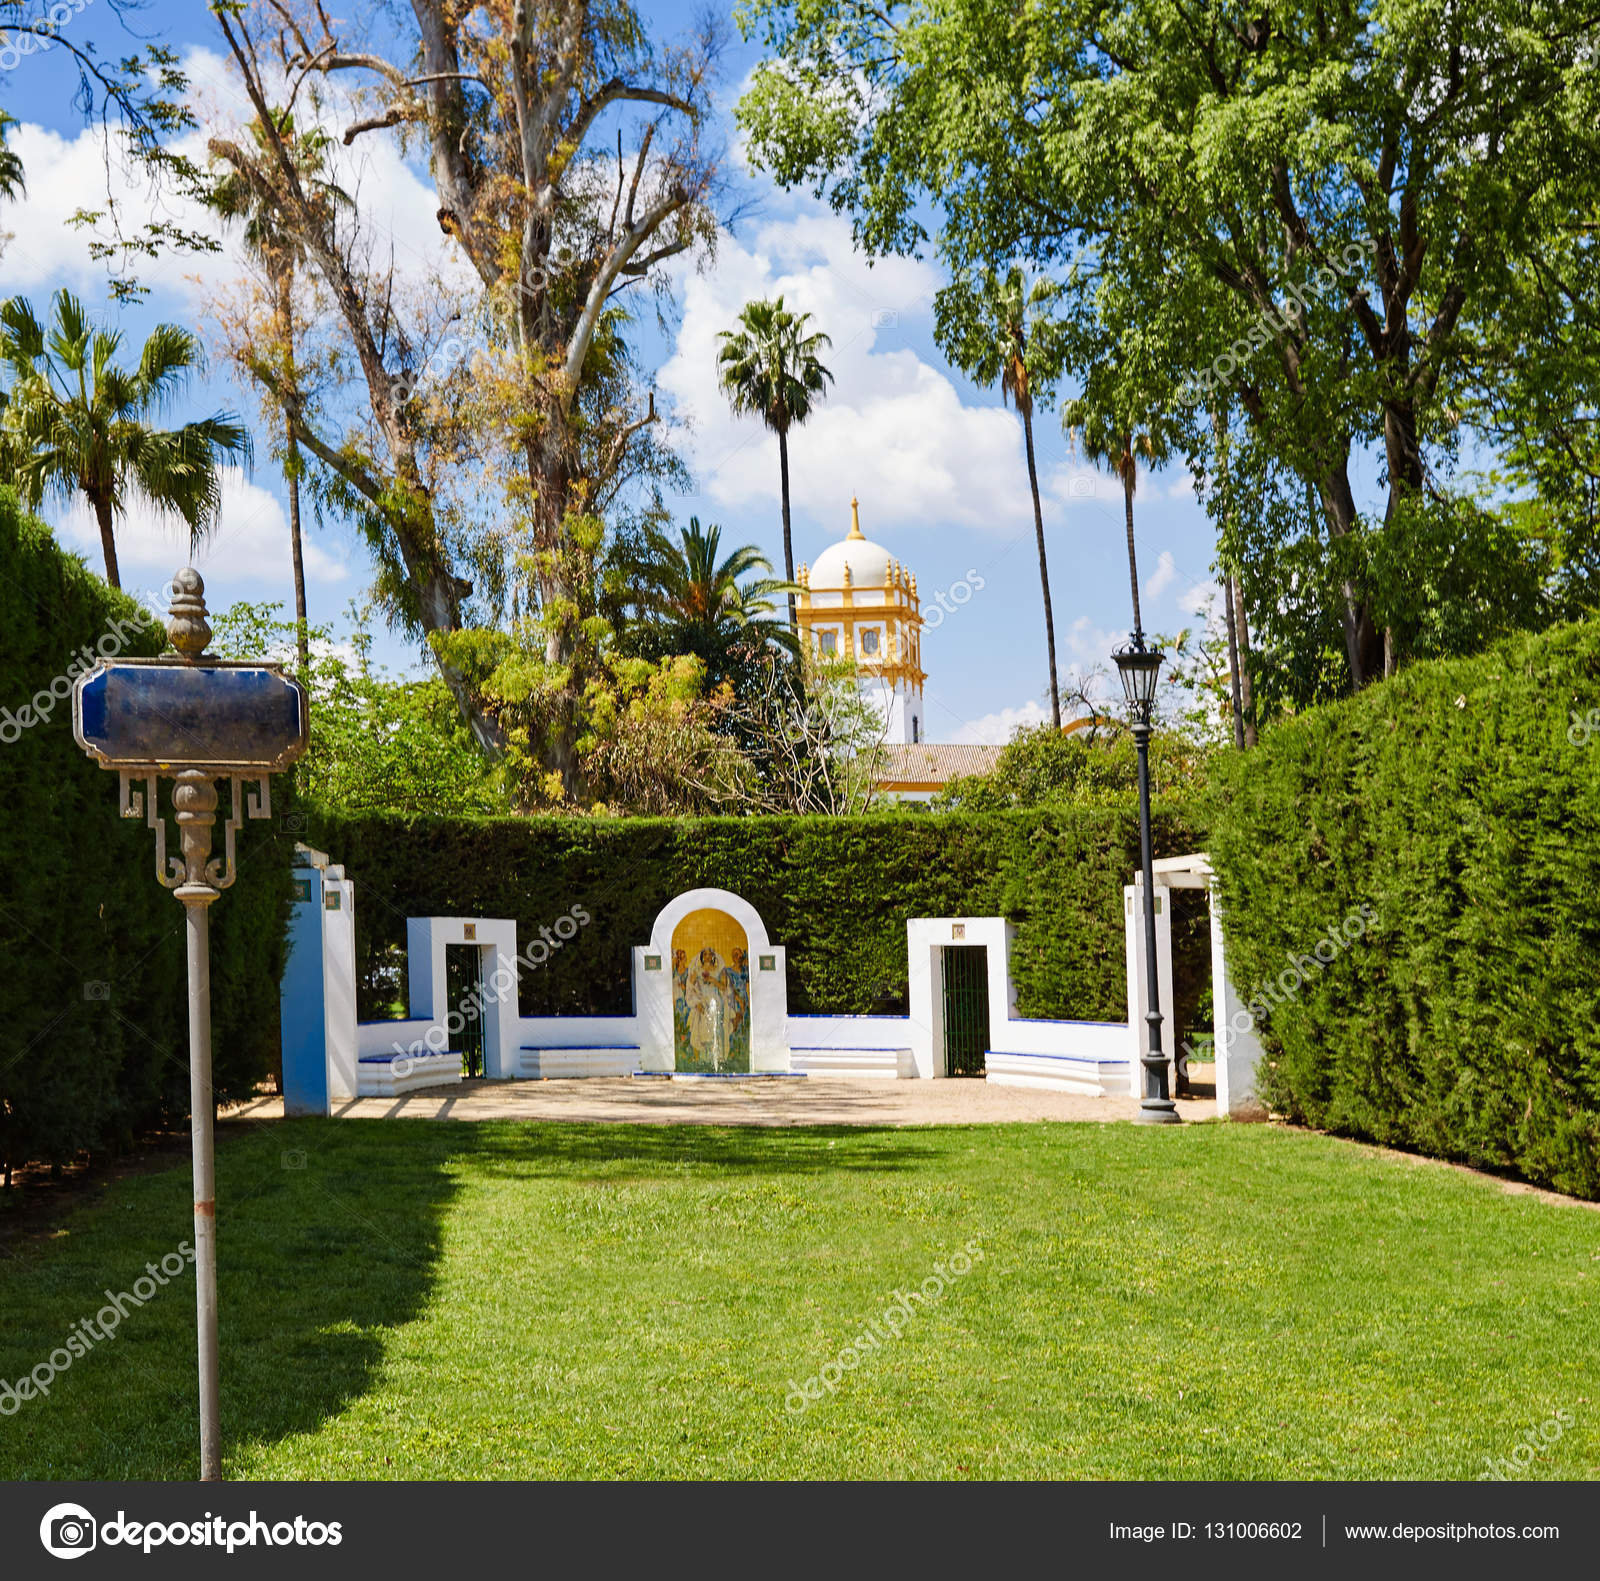 Sevilla maria luisa parque jardines espa a foto de stock tono balaguer 131006602 - Jardines de sevilla ...